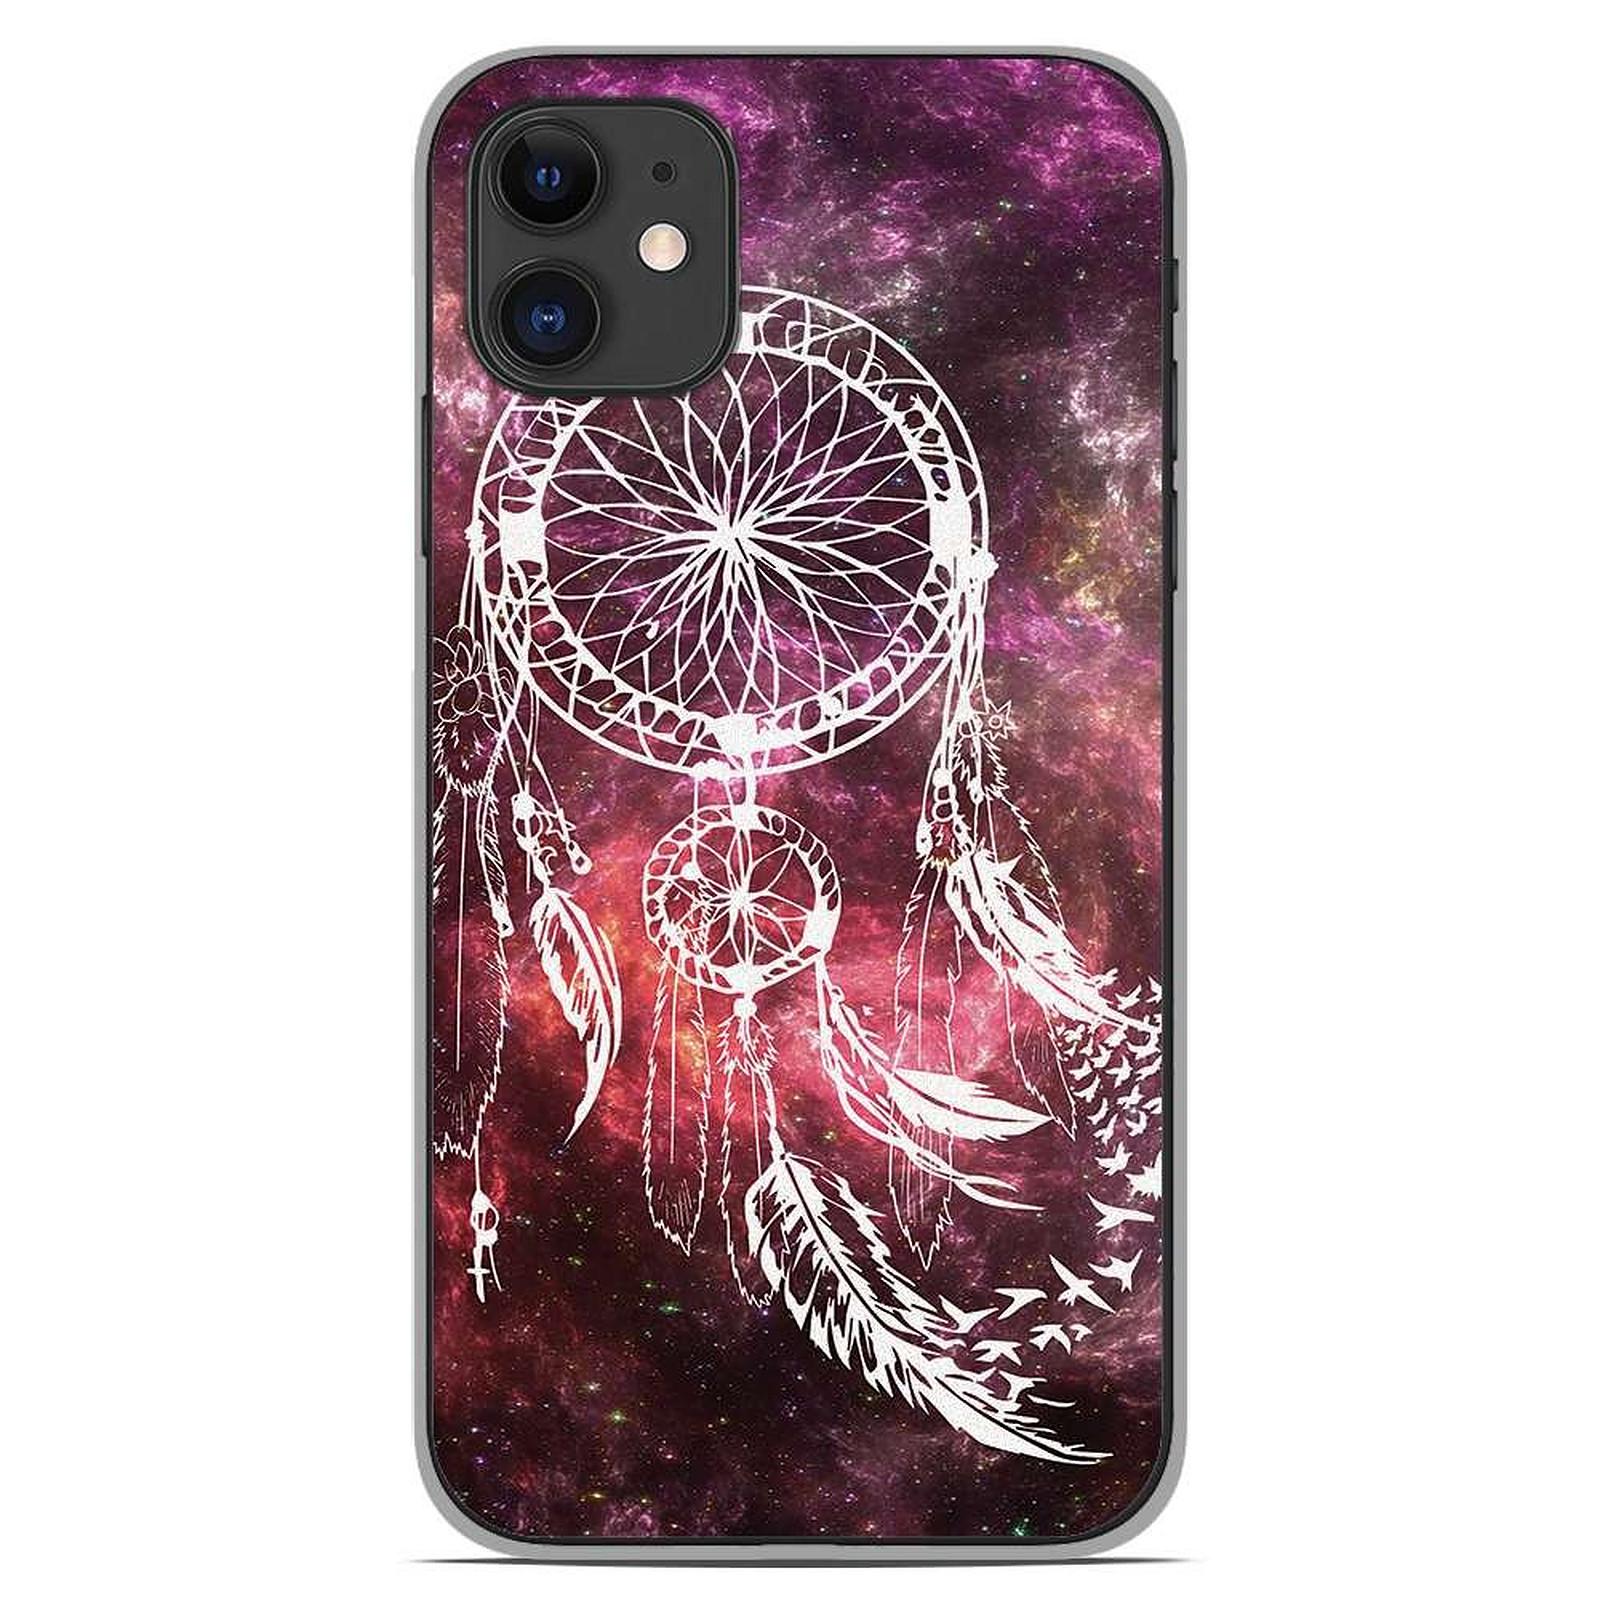 1001 Coques Coque silicone gel Apple iPhone 11 motif Dreamcatcher Space